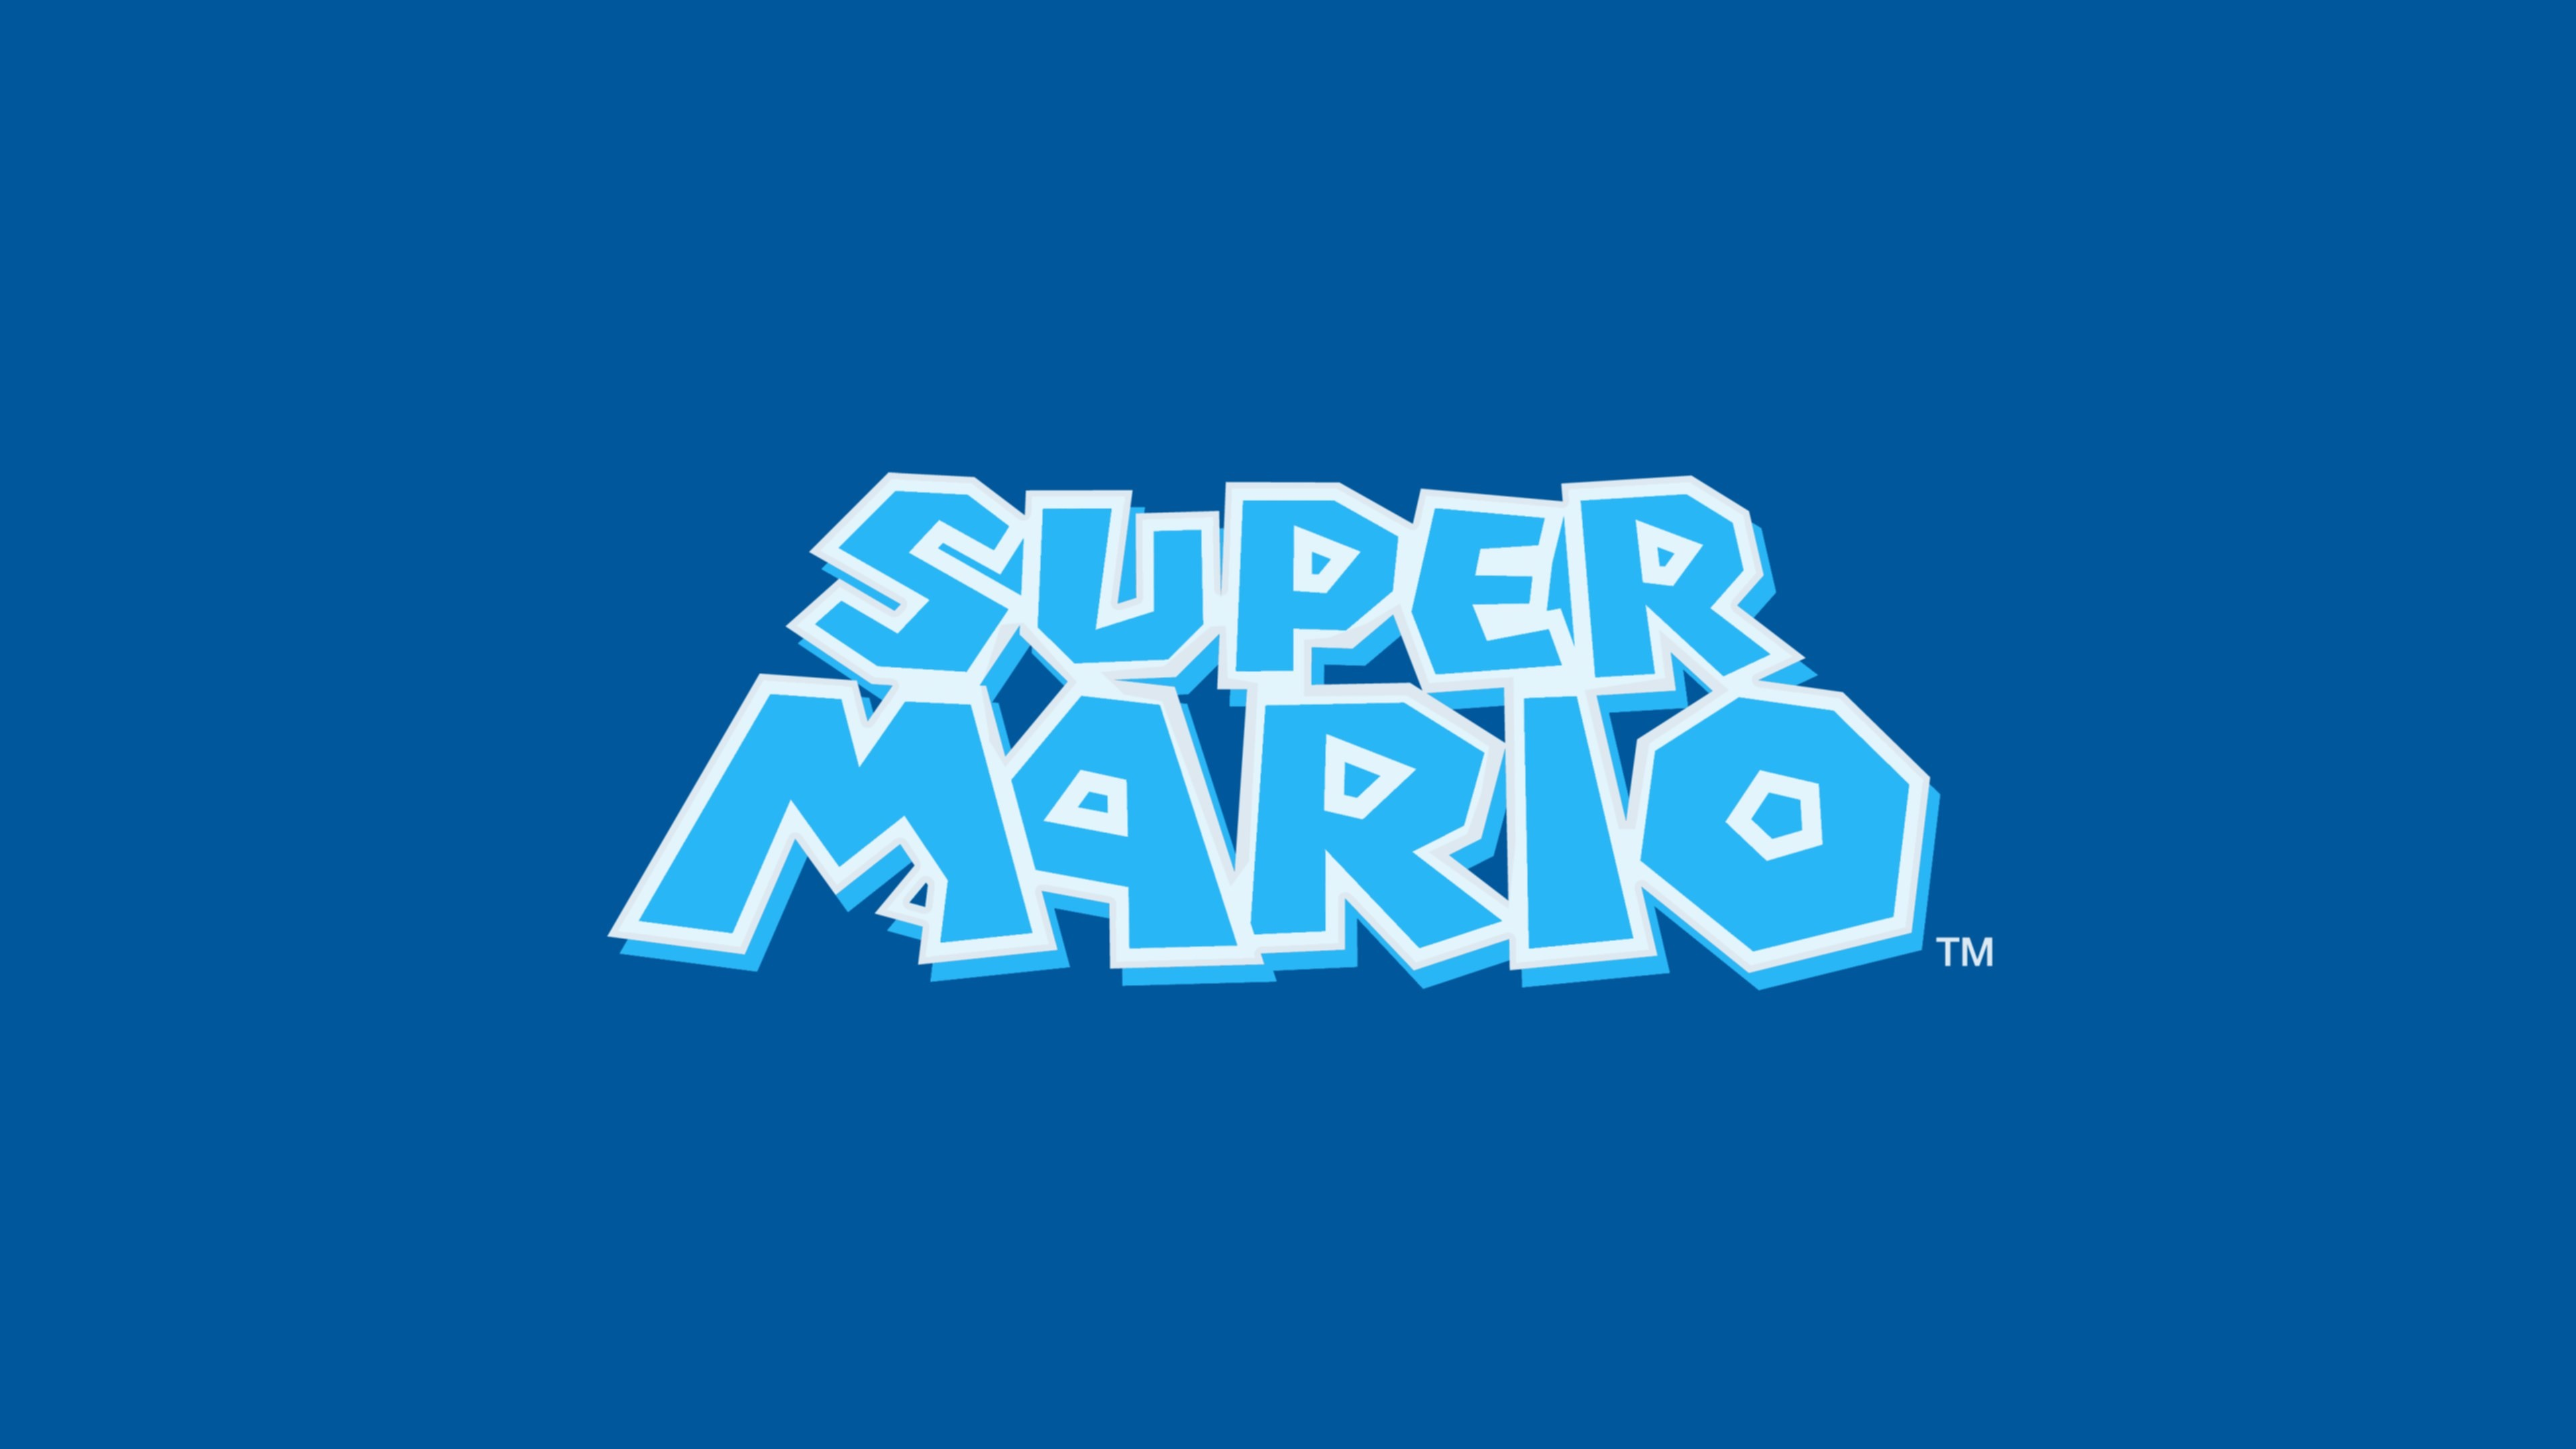 2017-03-27 – super mario bros image – Full HD Wallpapers, Photos, #1678663